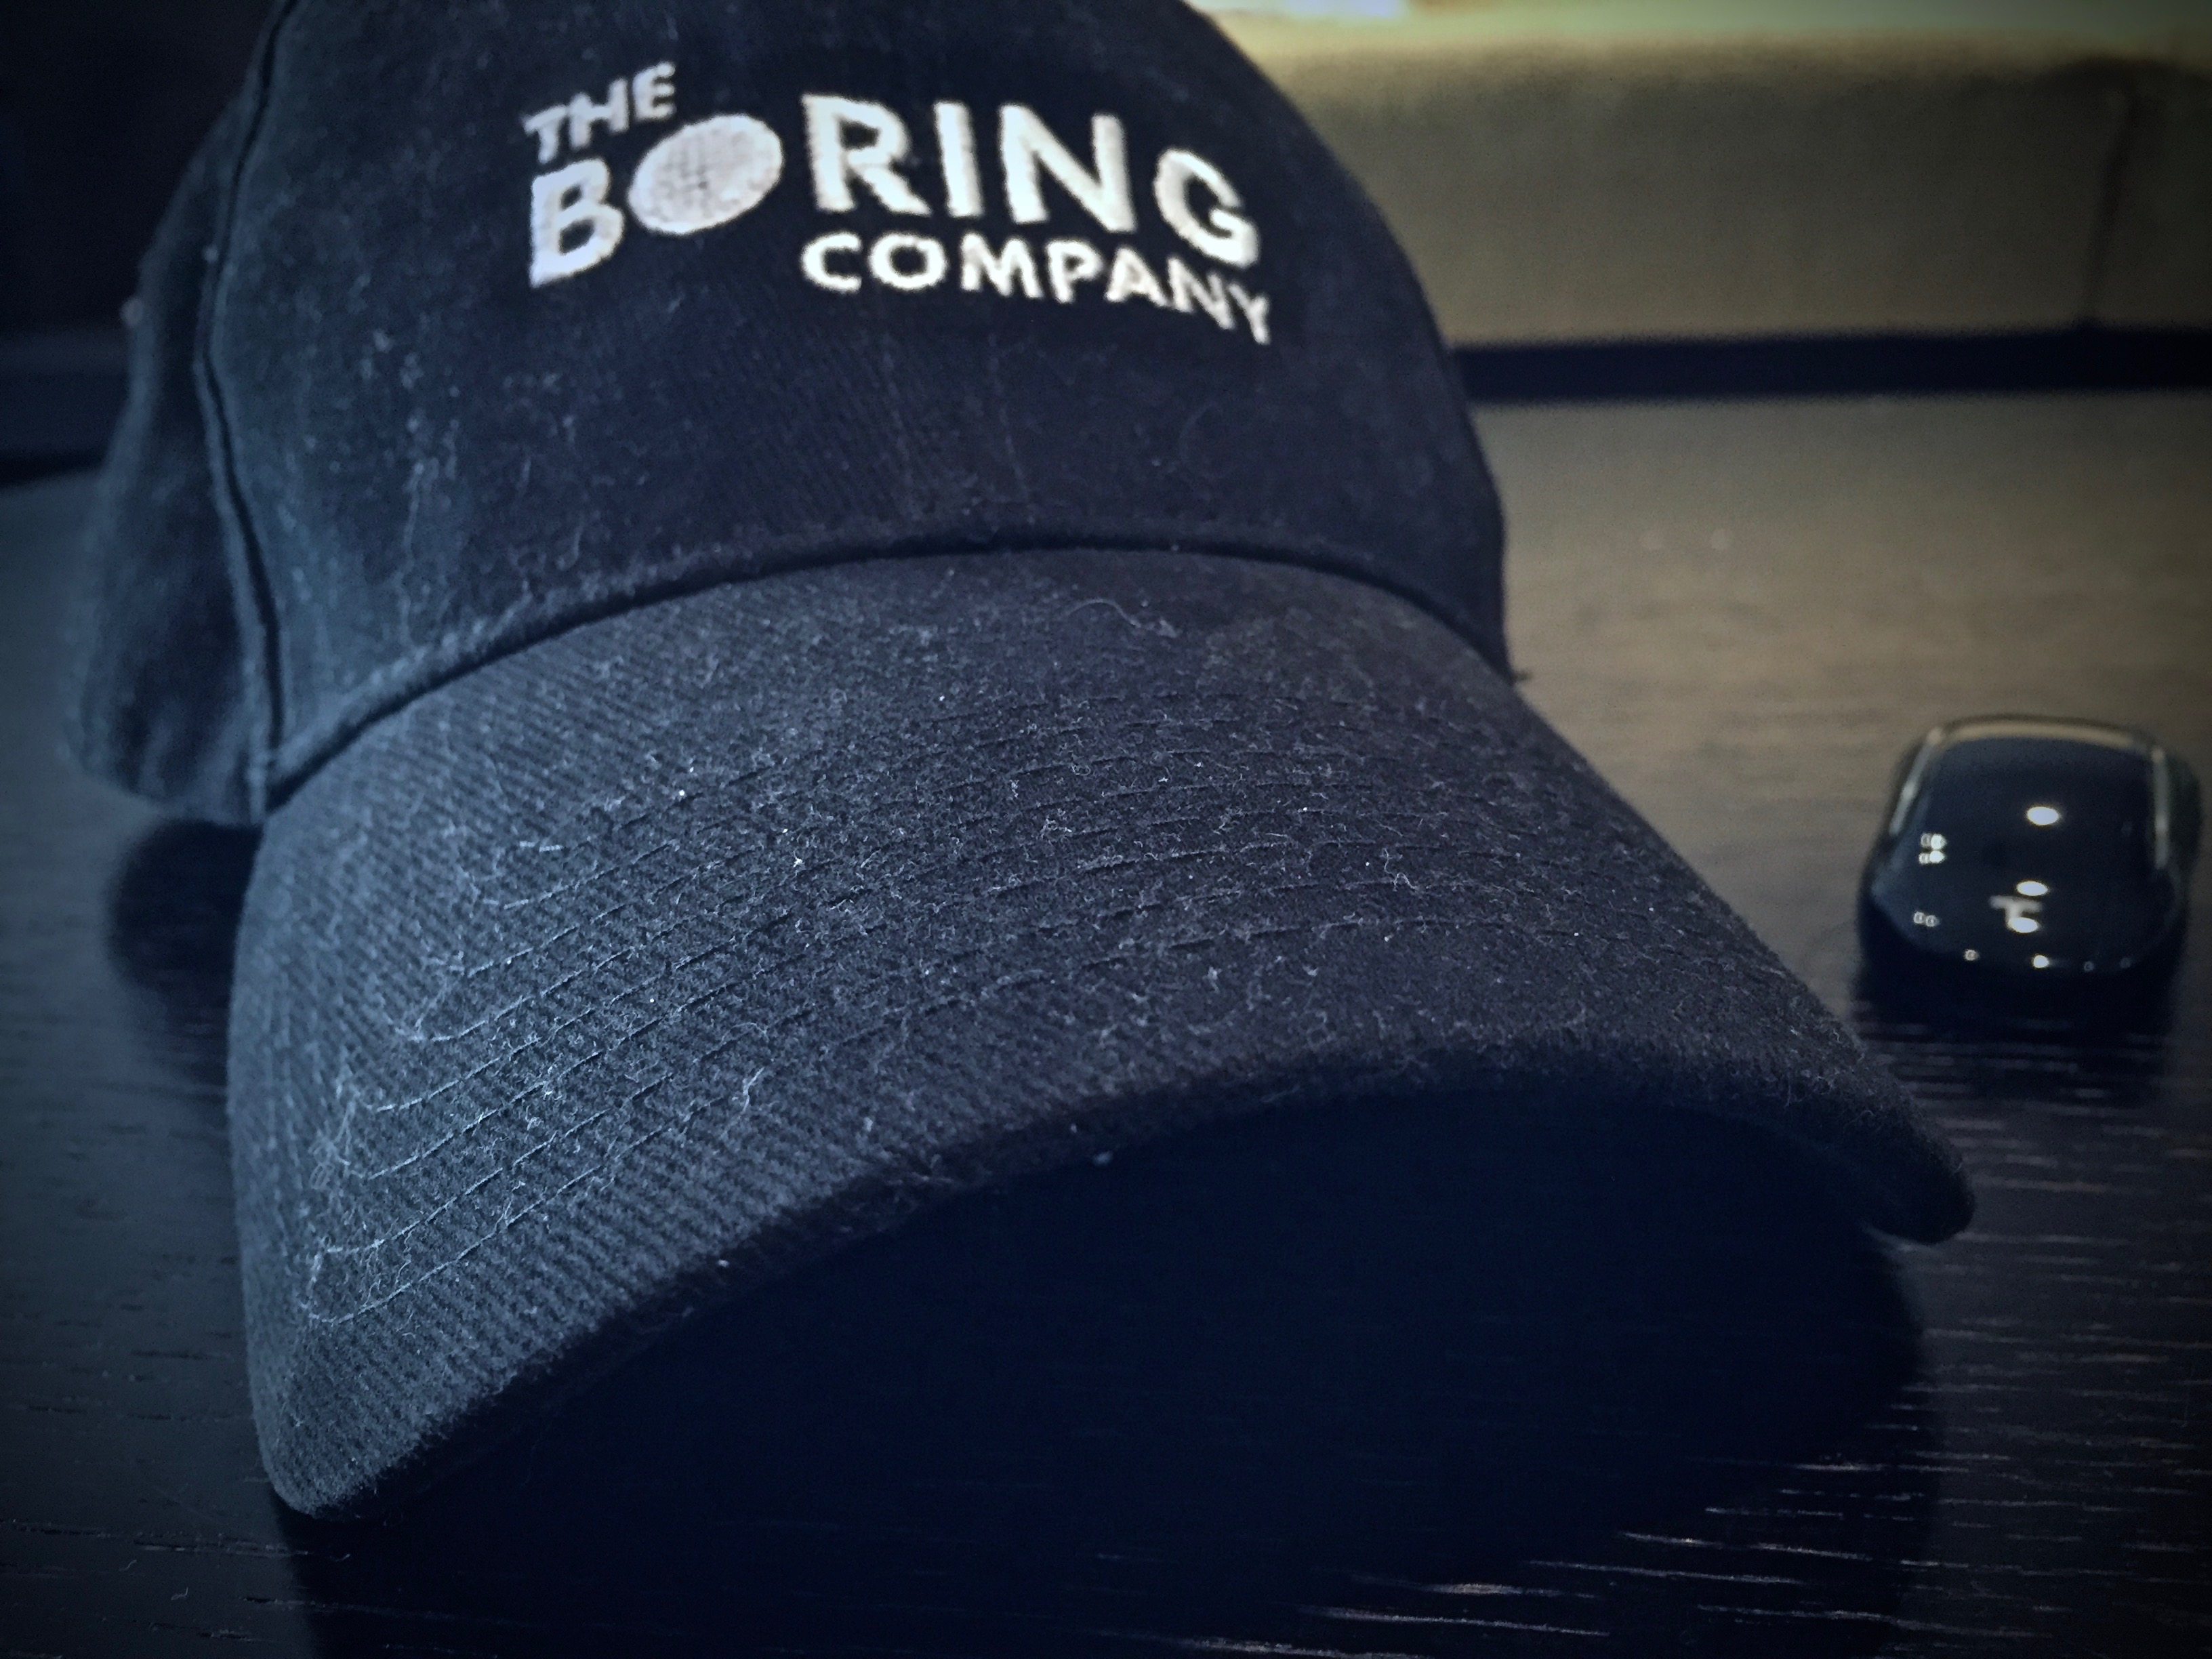 https://cdn.teslarati.com/wp-content/uploads/2017/12/the-boring-company-hat-tesla-keyfob.jpg